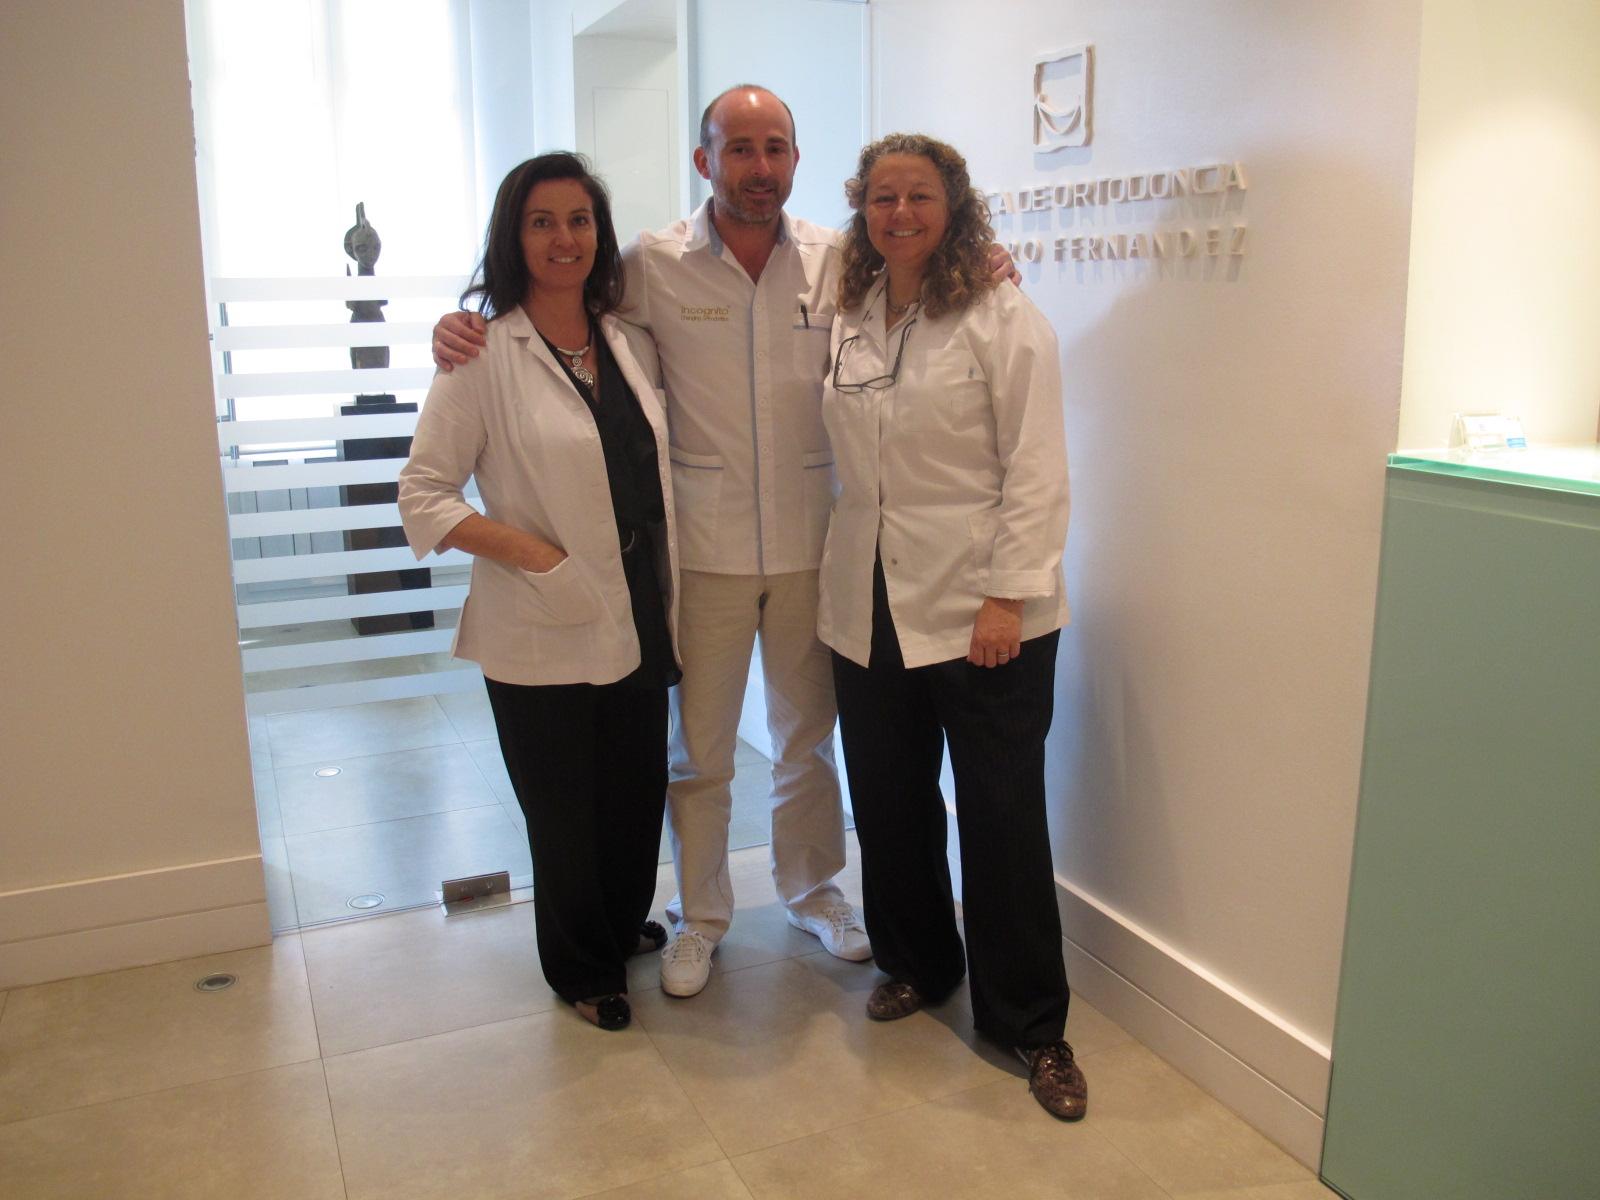 Dra. Emma Serra, Dr. Leandro Fernández y Dra. Ana Molina.